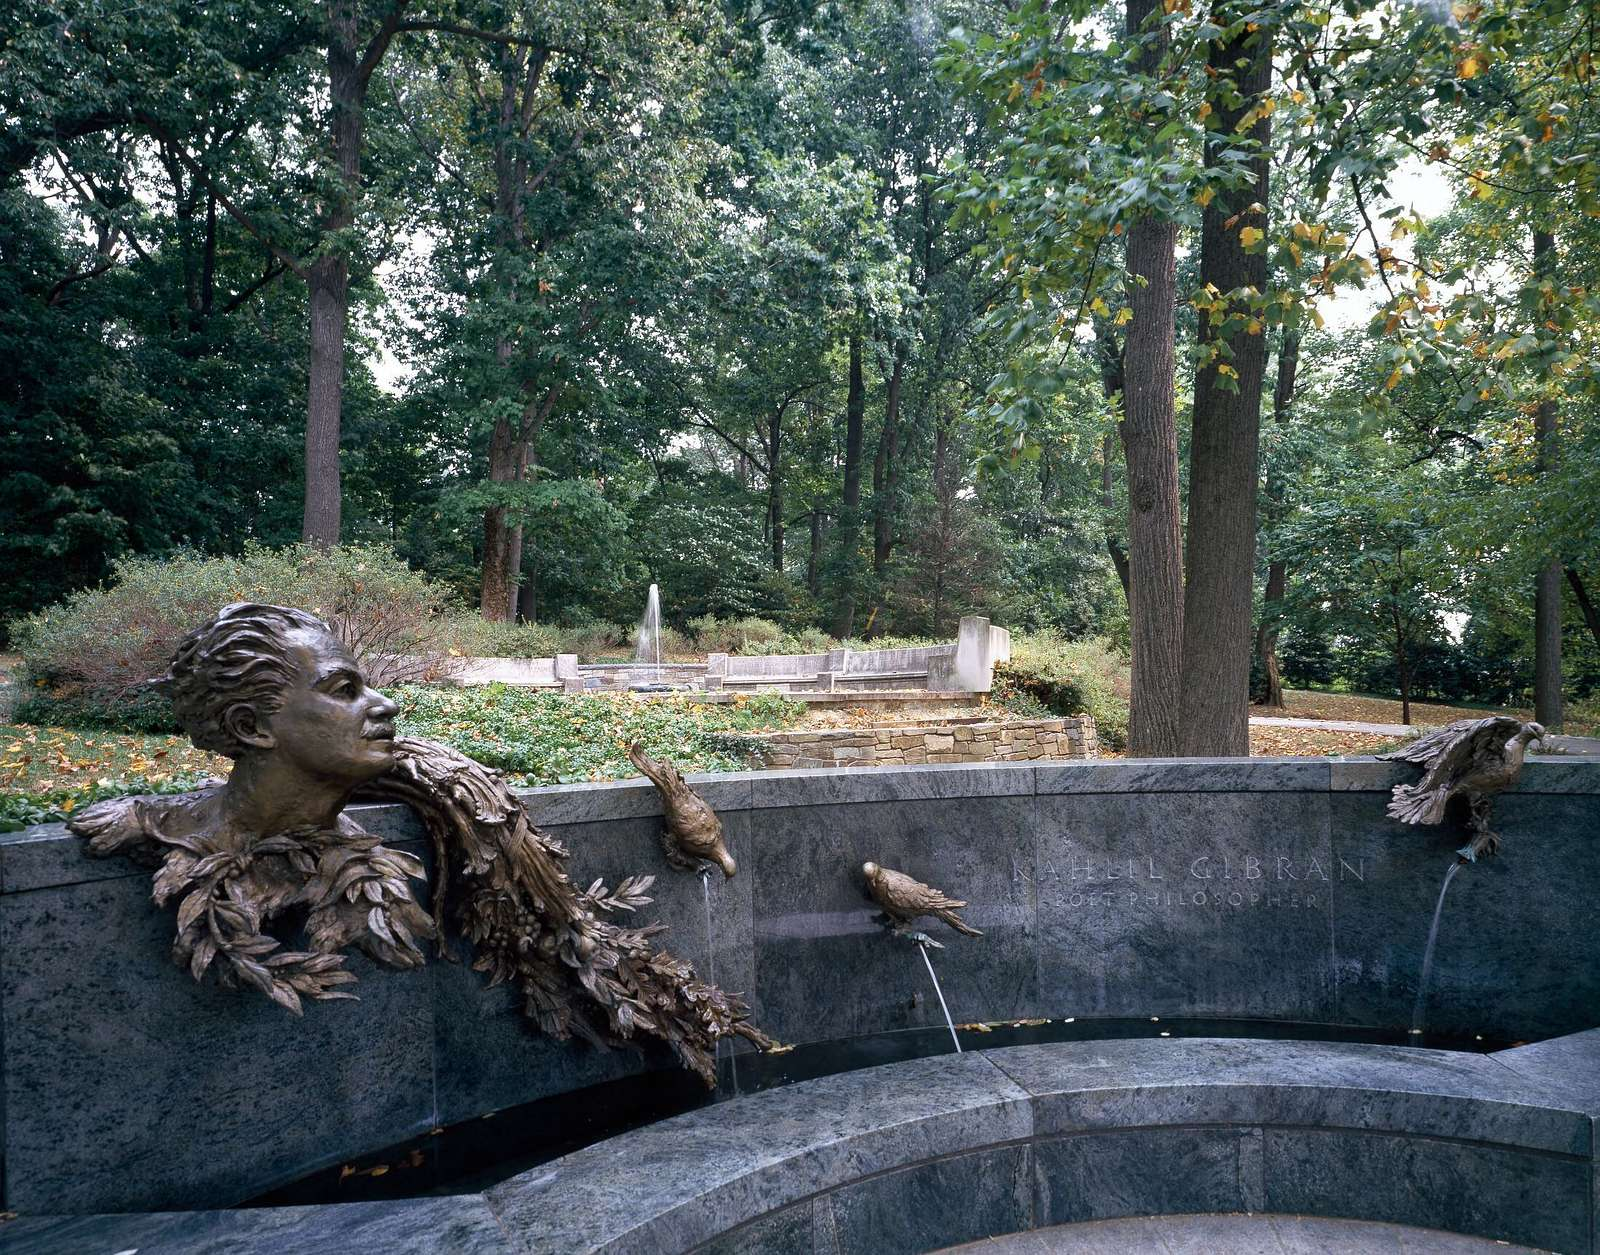 Poet Kahlil Gibran Memorial in Washington, D.C.